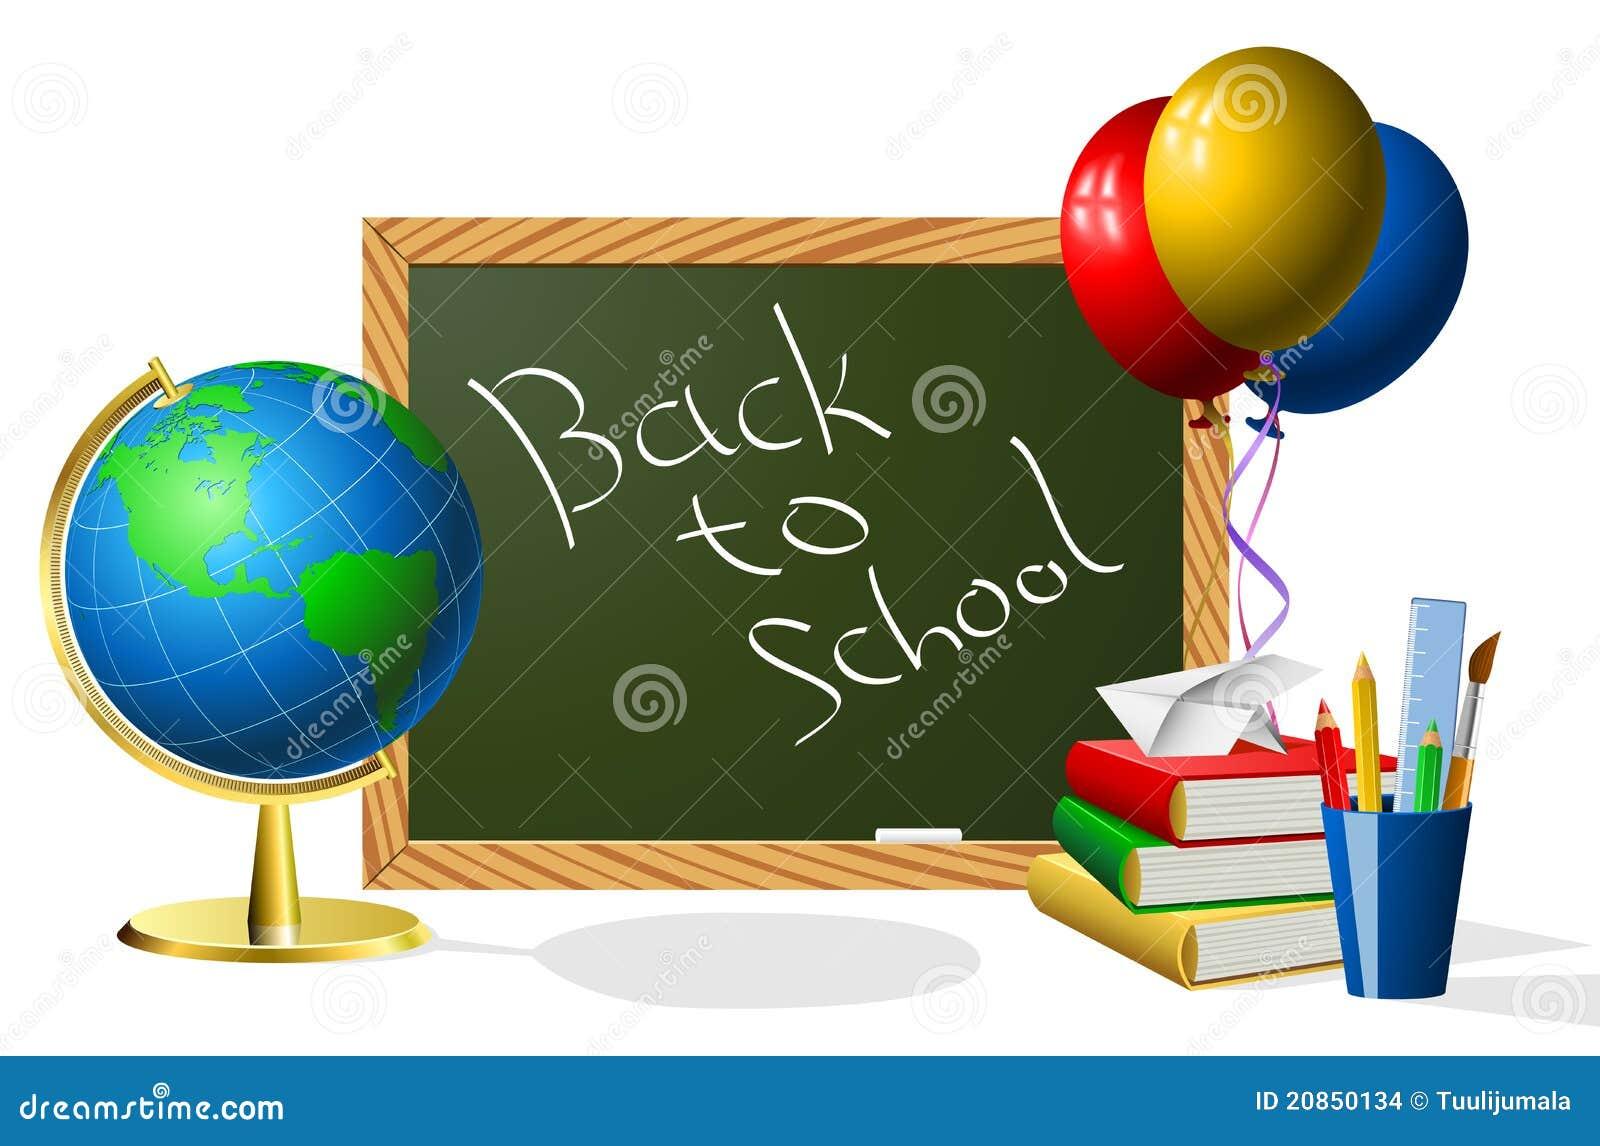 School year beginning